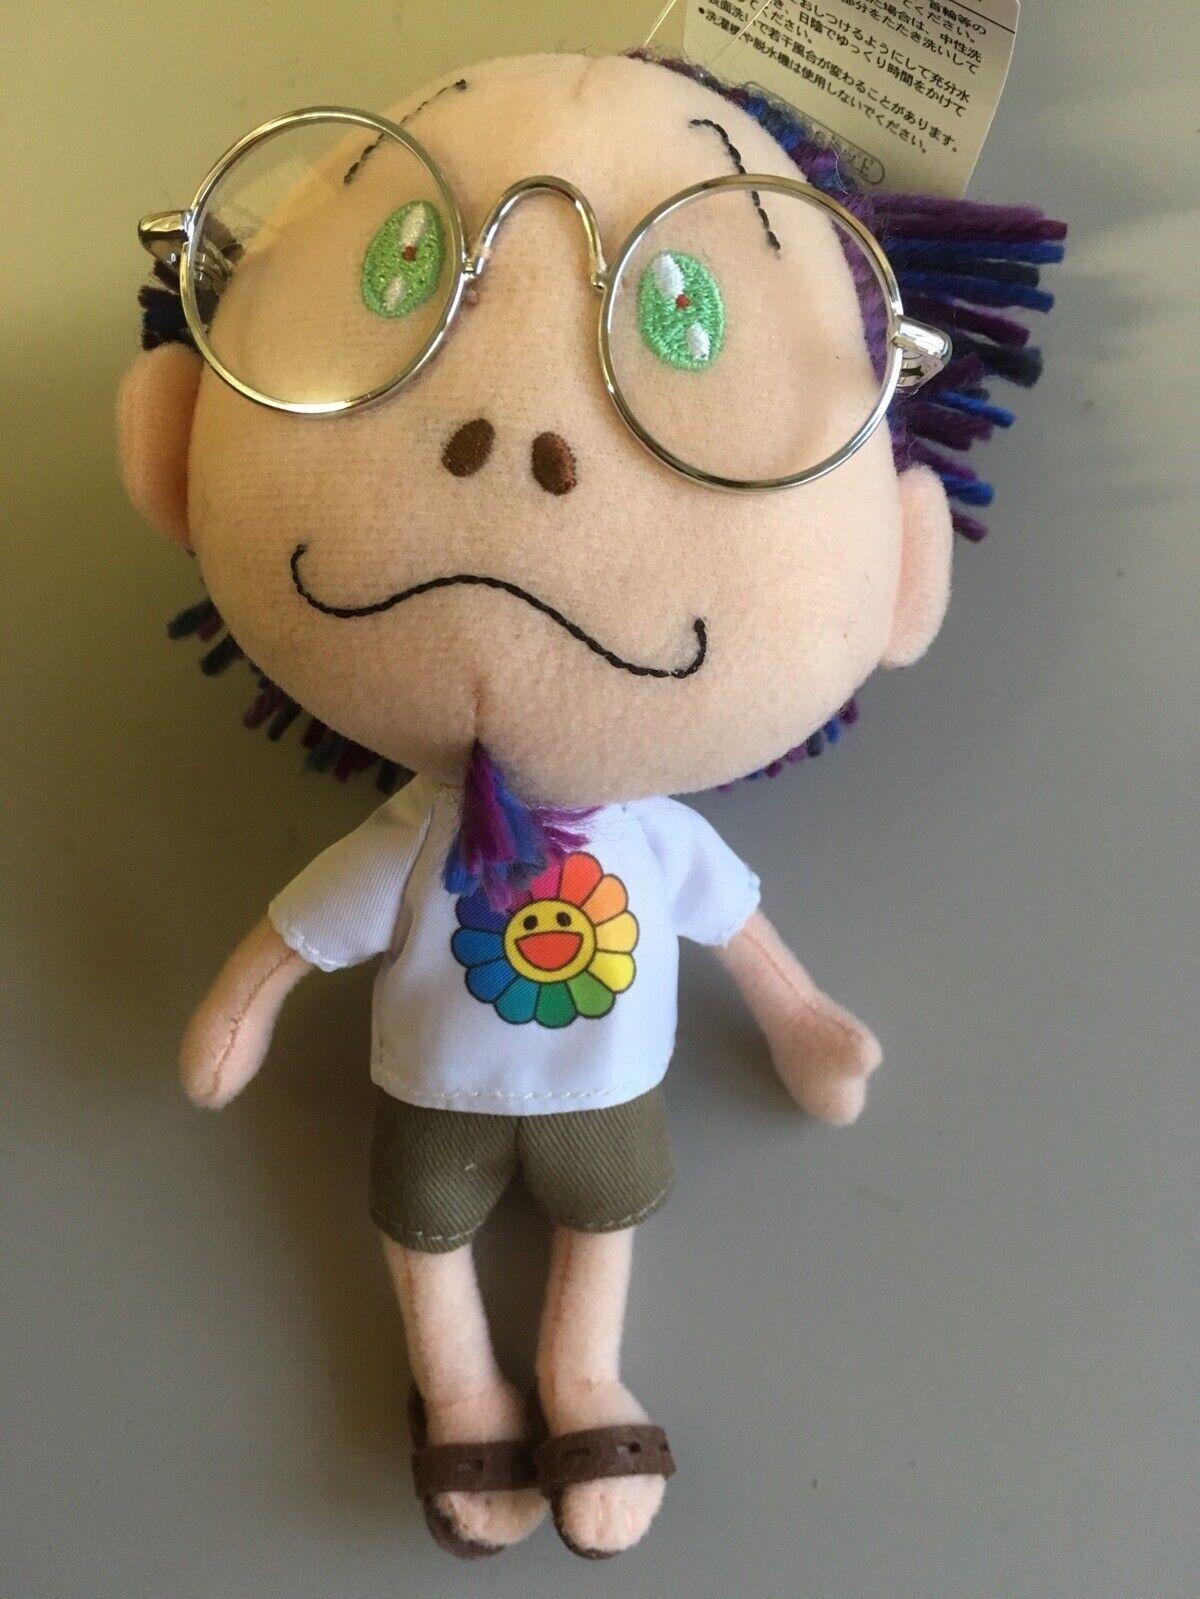 Murakami Takashi in Glasses Mascot Large pillow cushion plush doll flower shirt